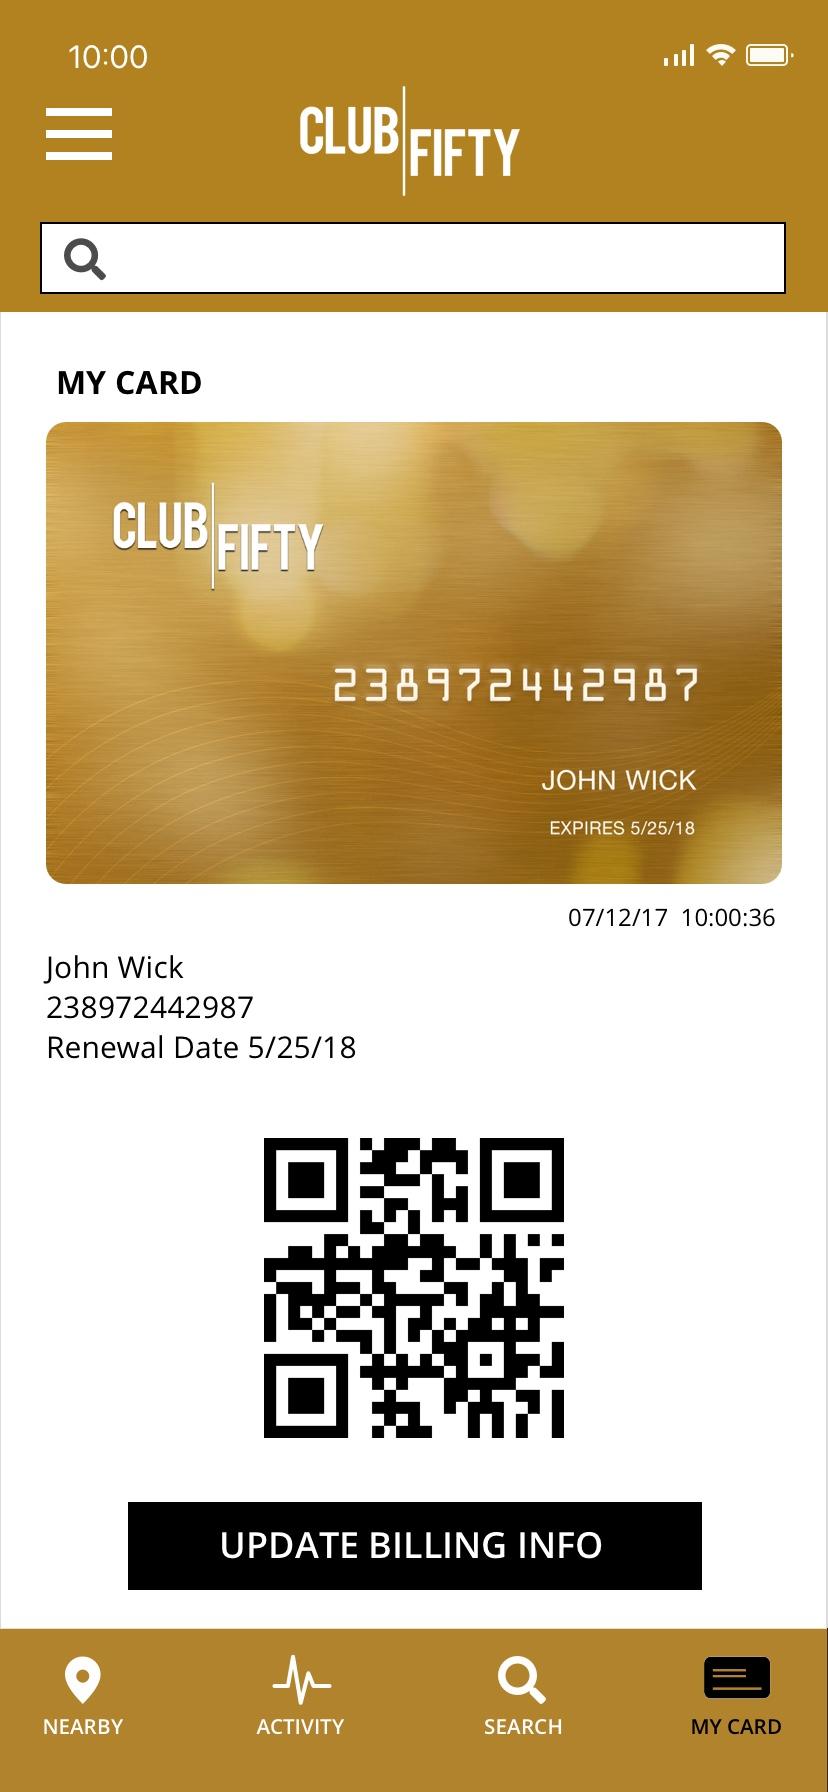 Club Fifty scannable QR code card